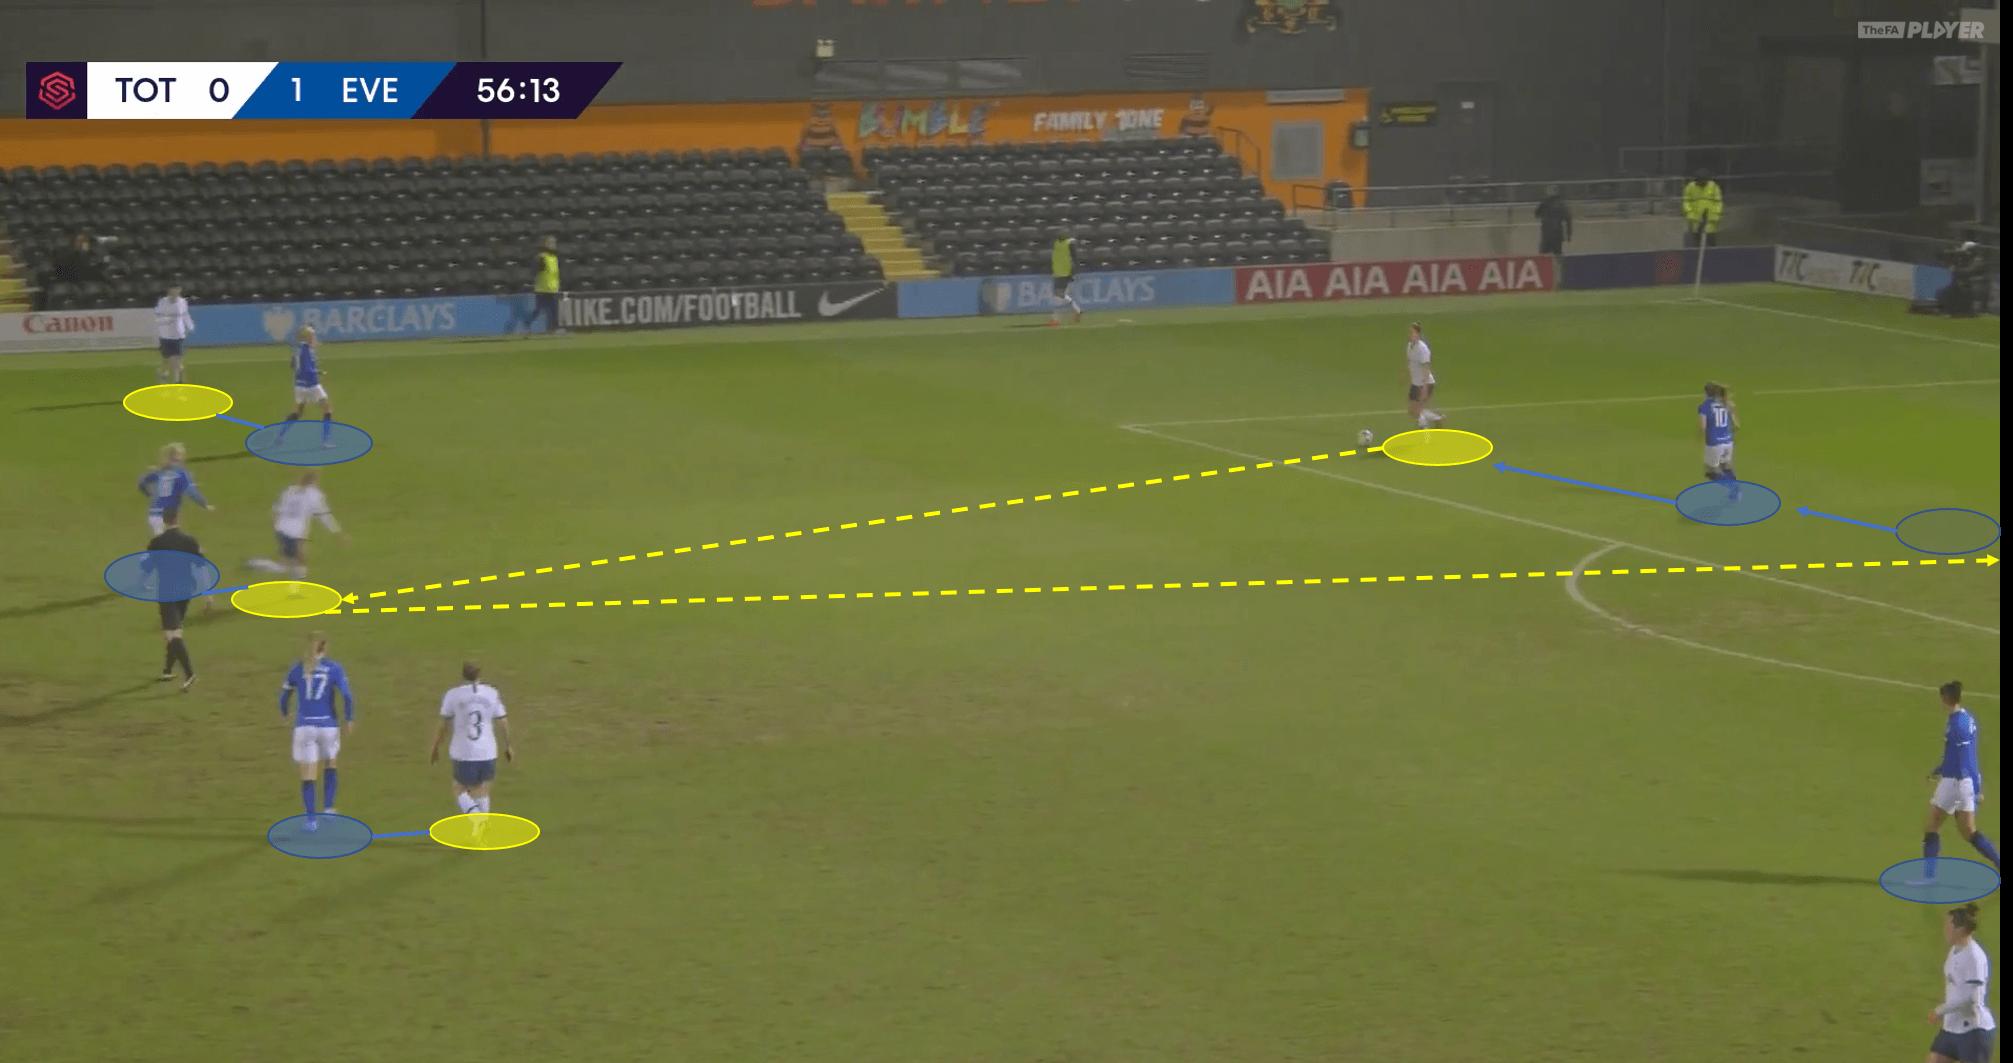 FAWSL 2019/20: Tottenham Women vs Everton Women - tactical analysis tactics